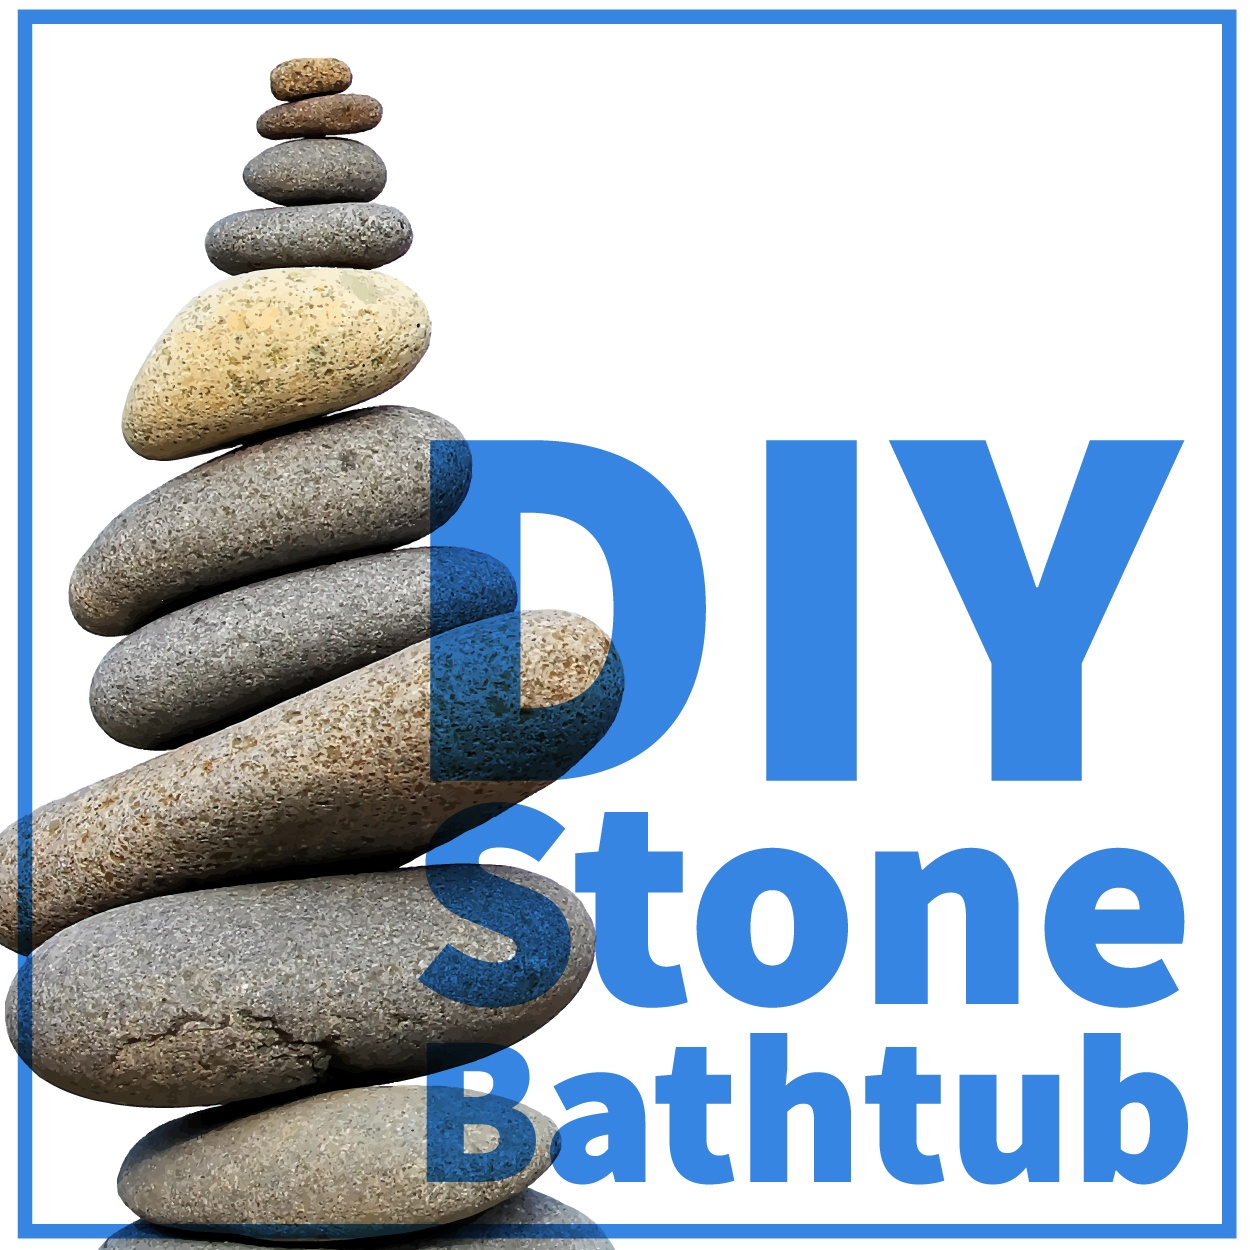 DIY Stone Bathtub - smcapproved.com